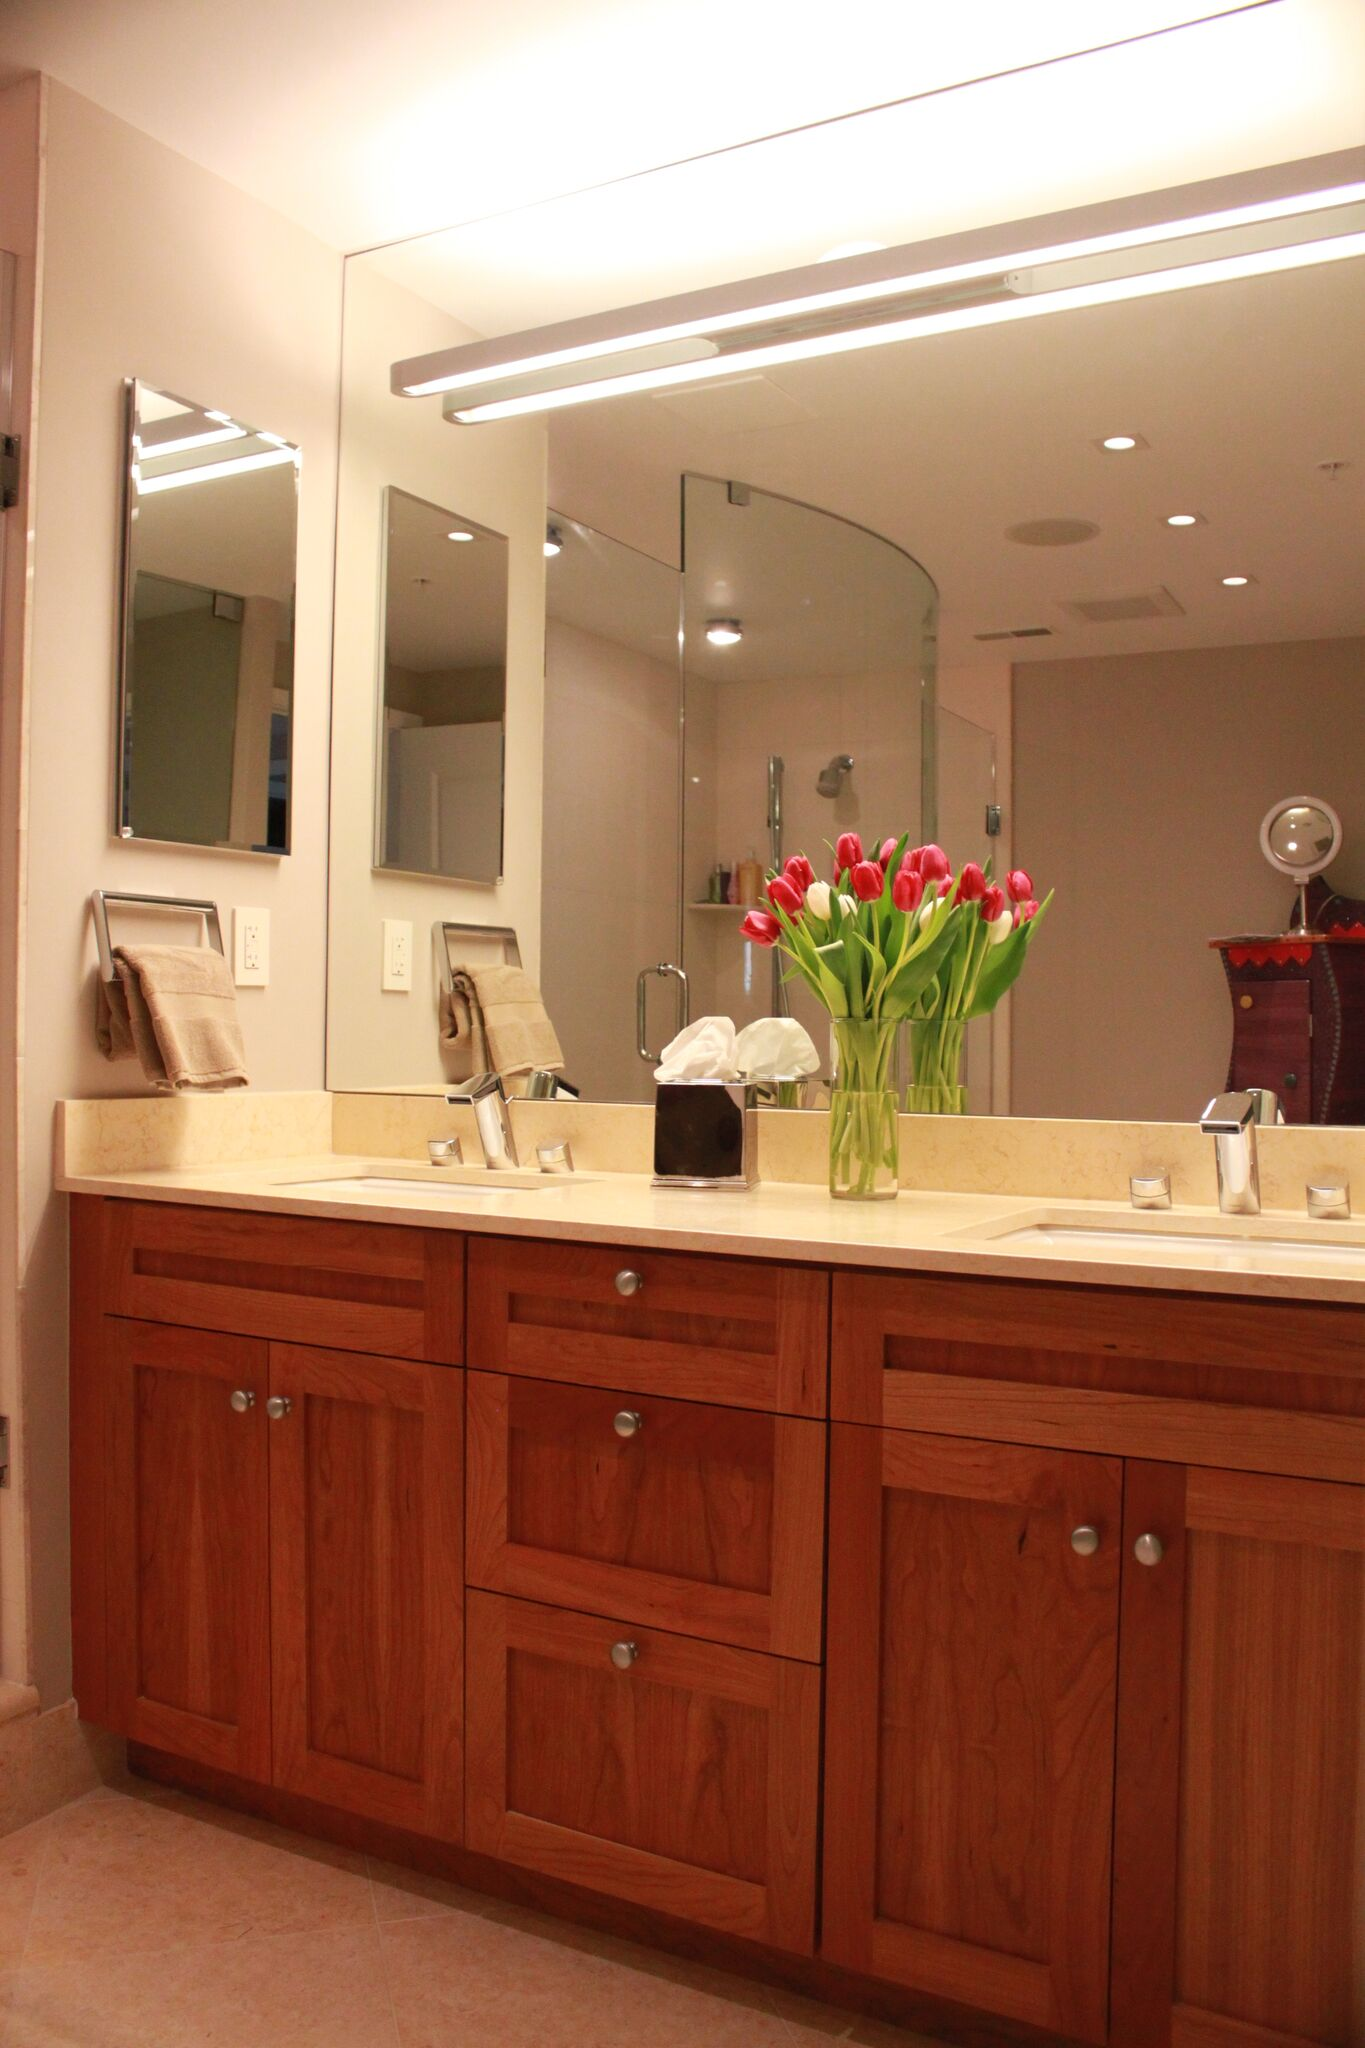 Bathroom Vanity Mirror - Site Const 4-min